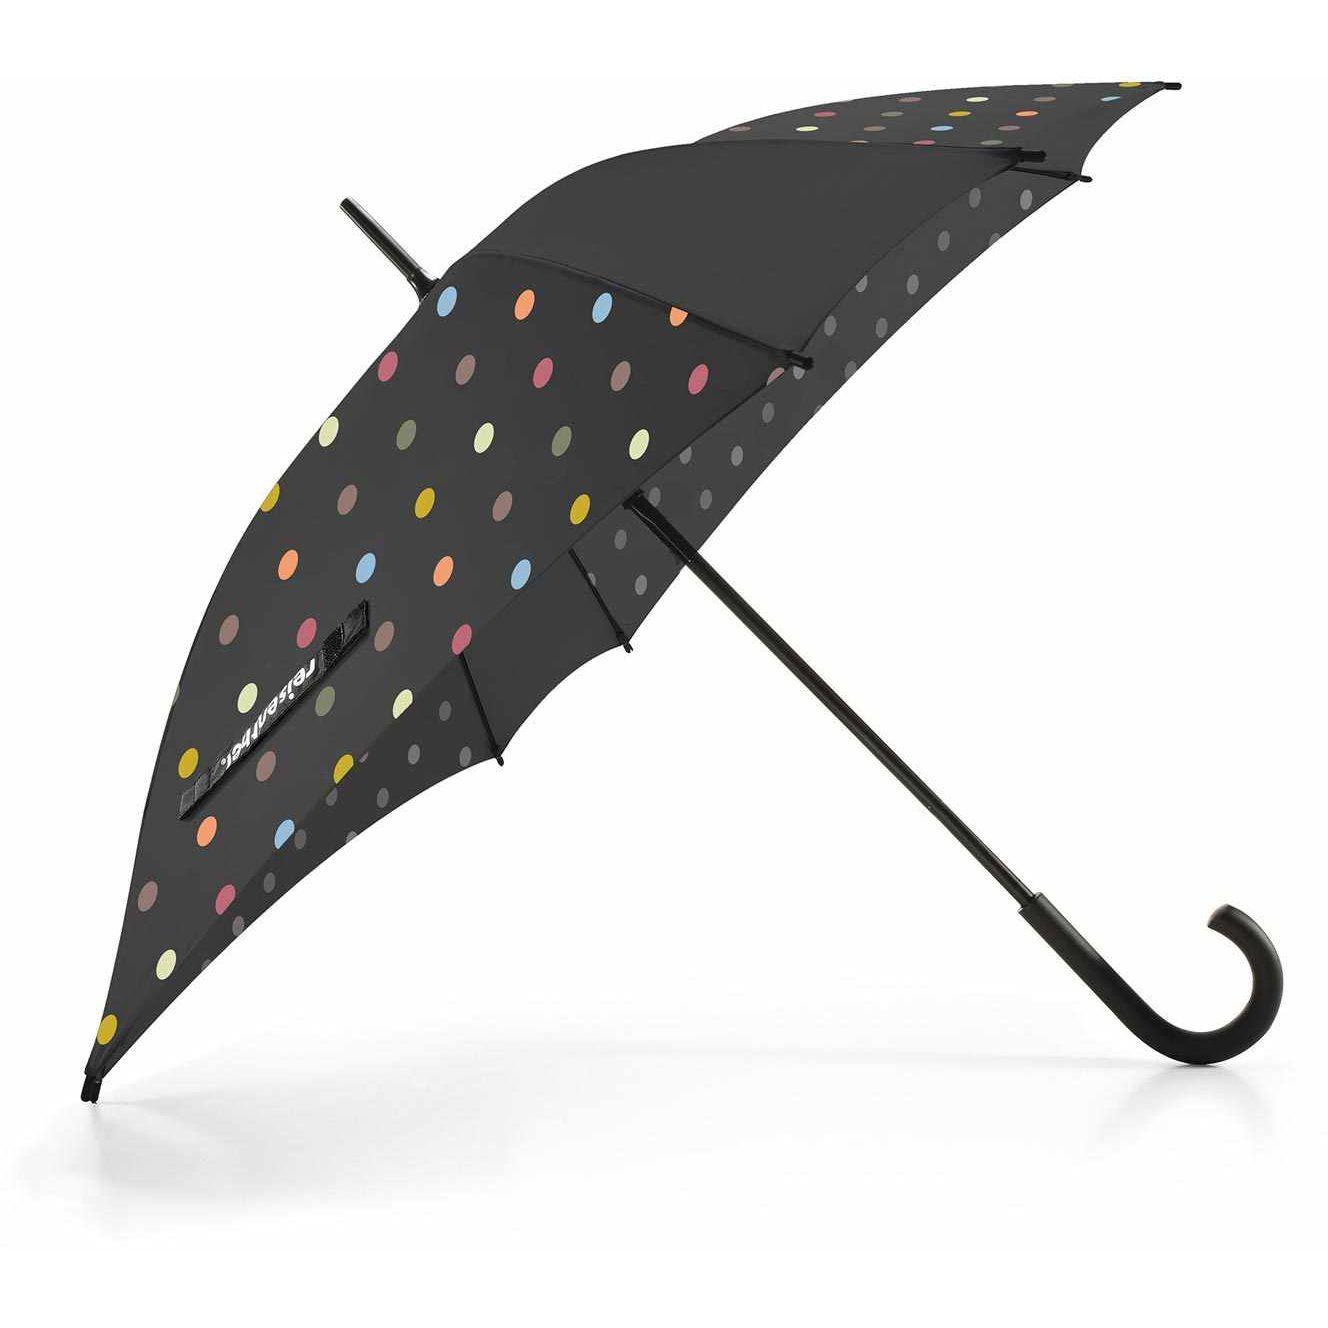 reisenthel travelling umbrella regenschirm kaufen bei. Black Bedroom Furniture Sets. Home Design Ideas